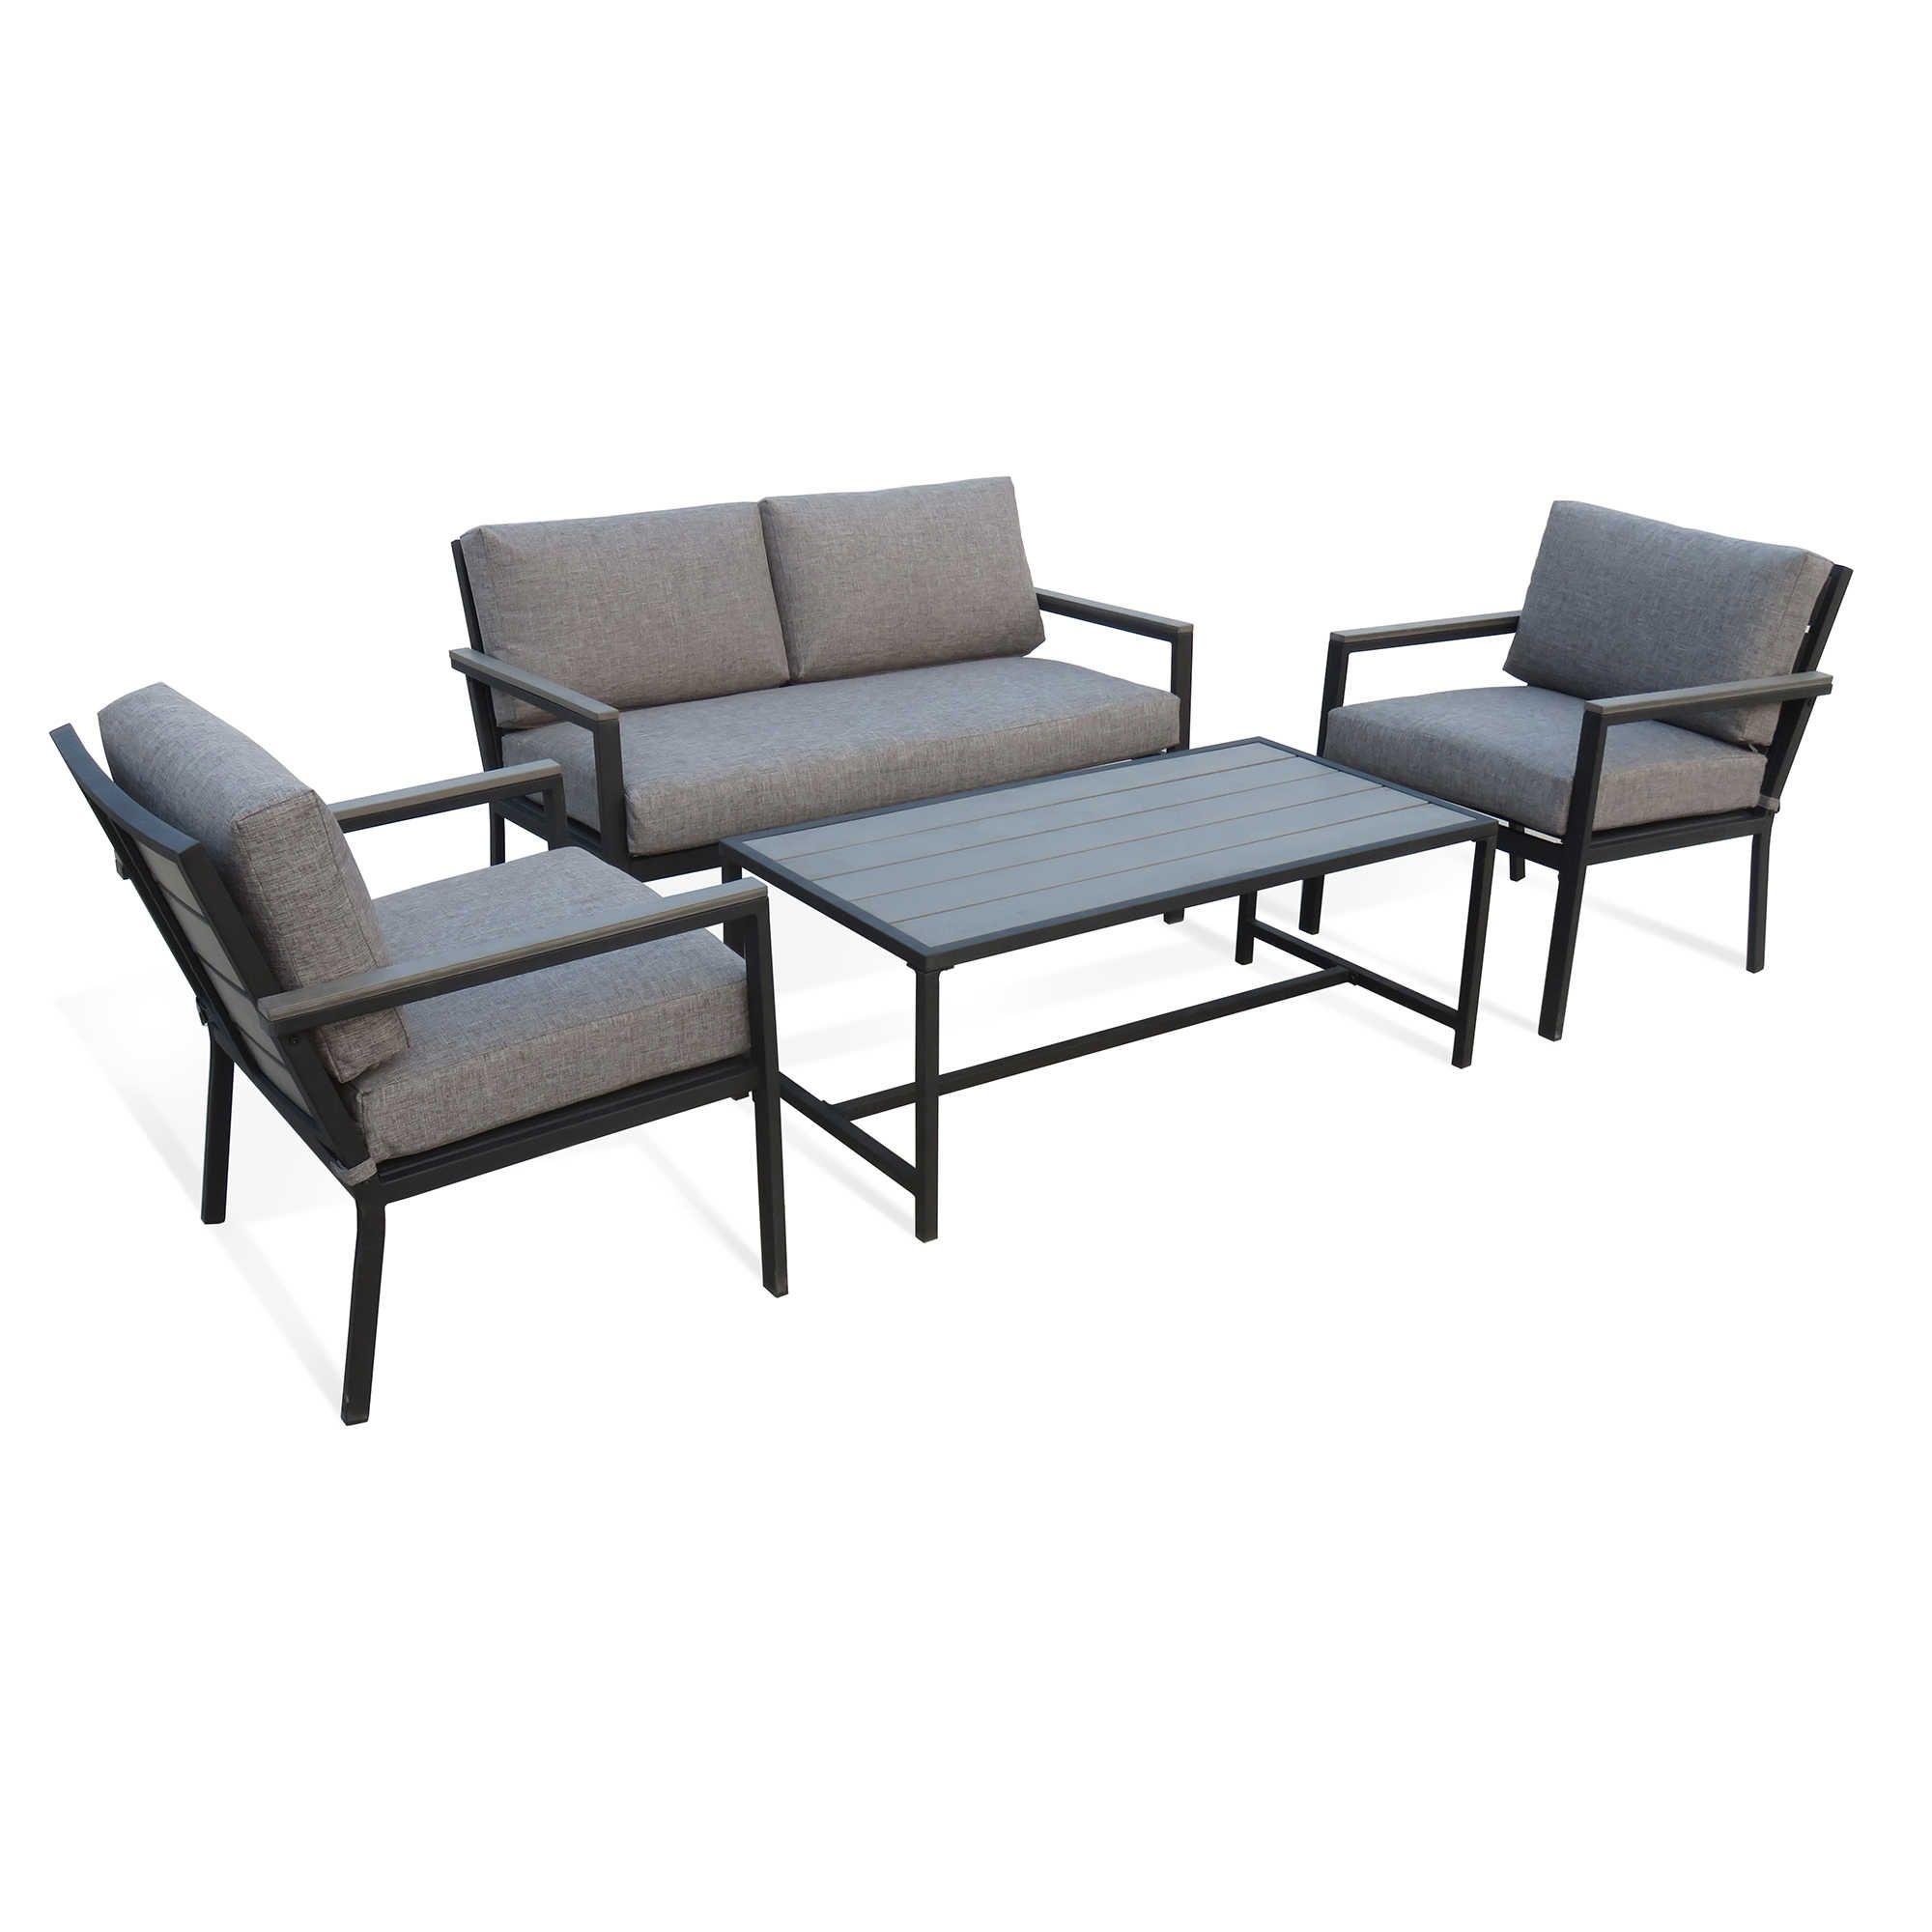 Summerwinds 4 Piece Outdoor Conversation Set Outdoor Conversation Sets Outdoor Sofa Outdoor Furniture Sets